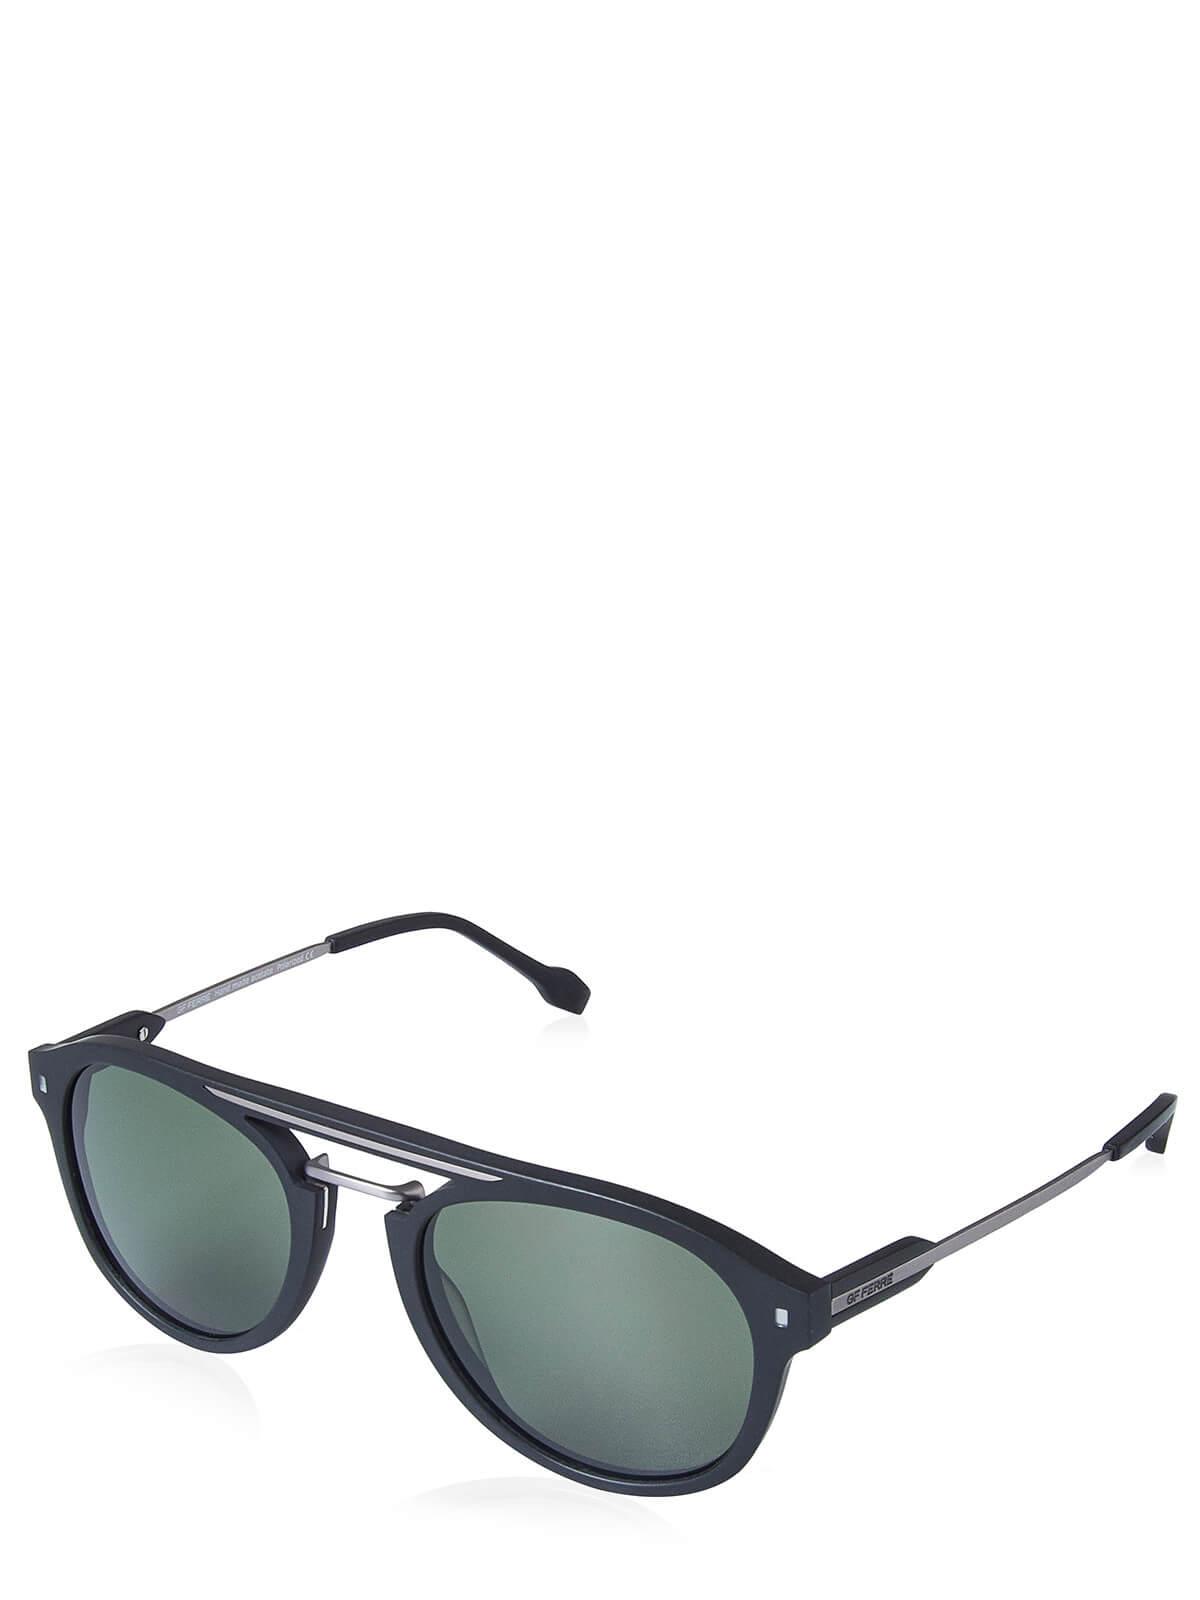 995eea566844a Gianfranco Ferre Sunglasses black